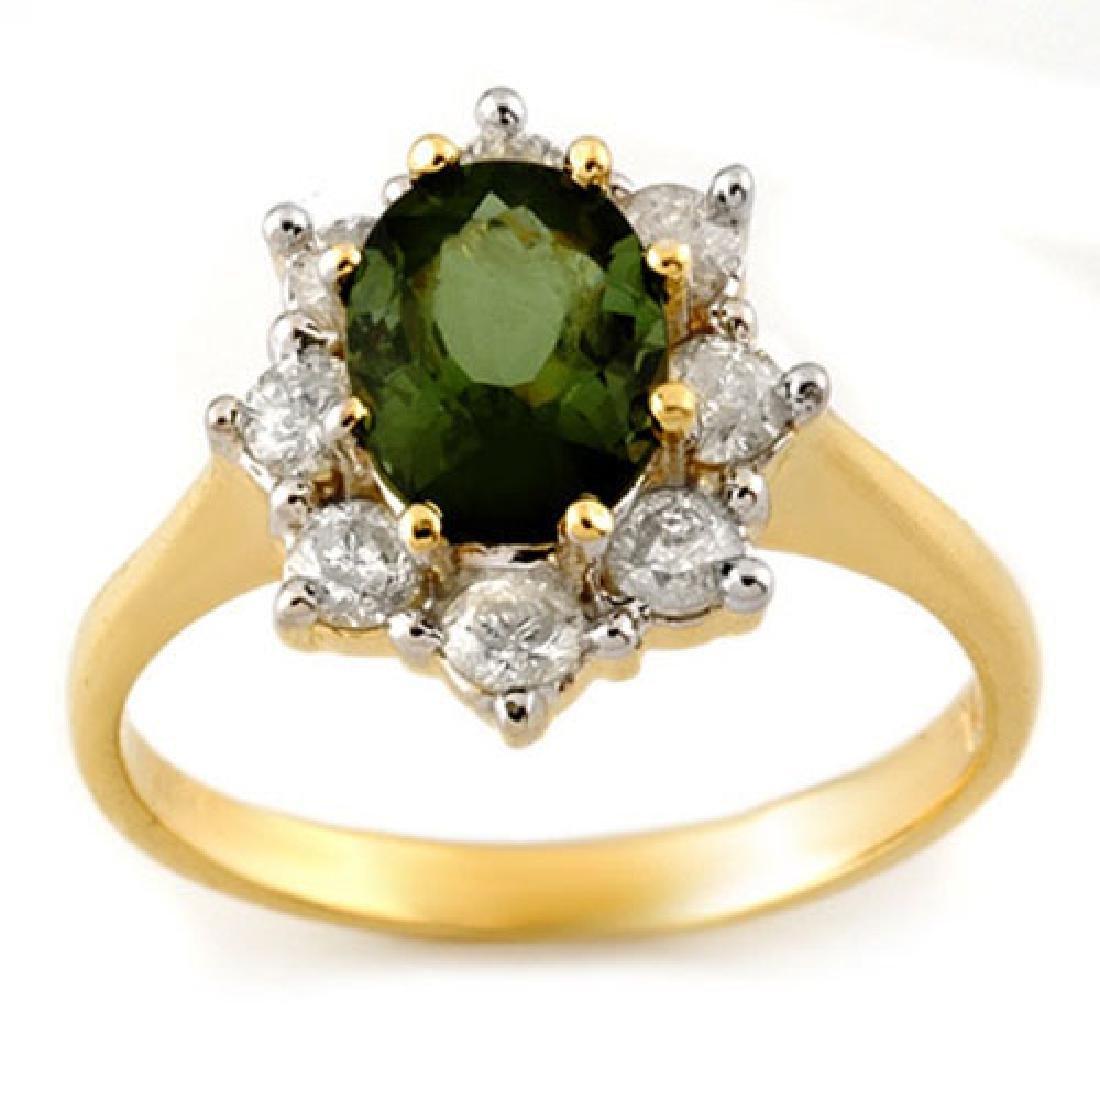 2.50 CTW Green Tourmaline & Diamond Ring 14K Yellow